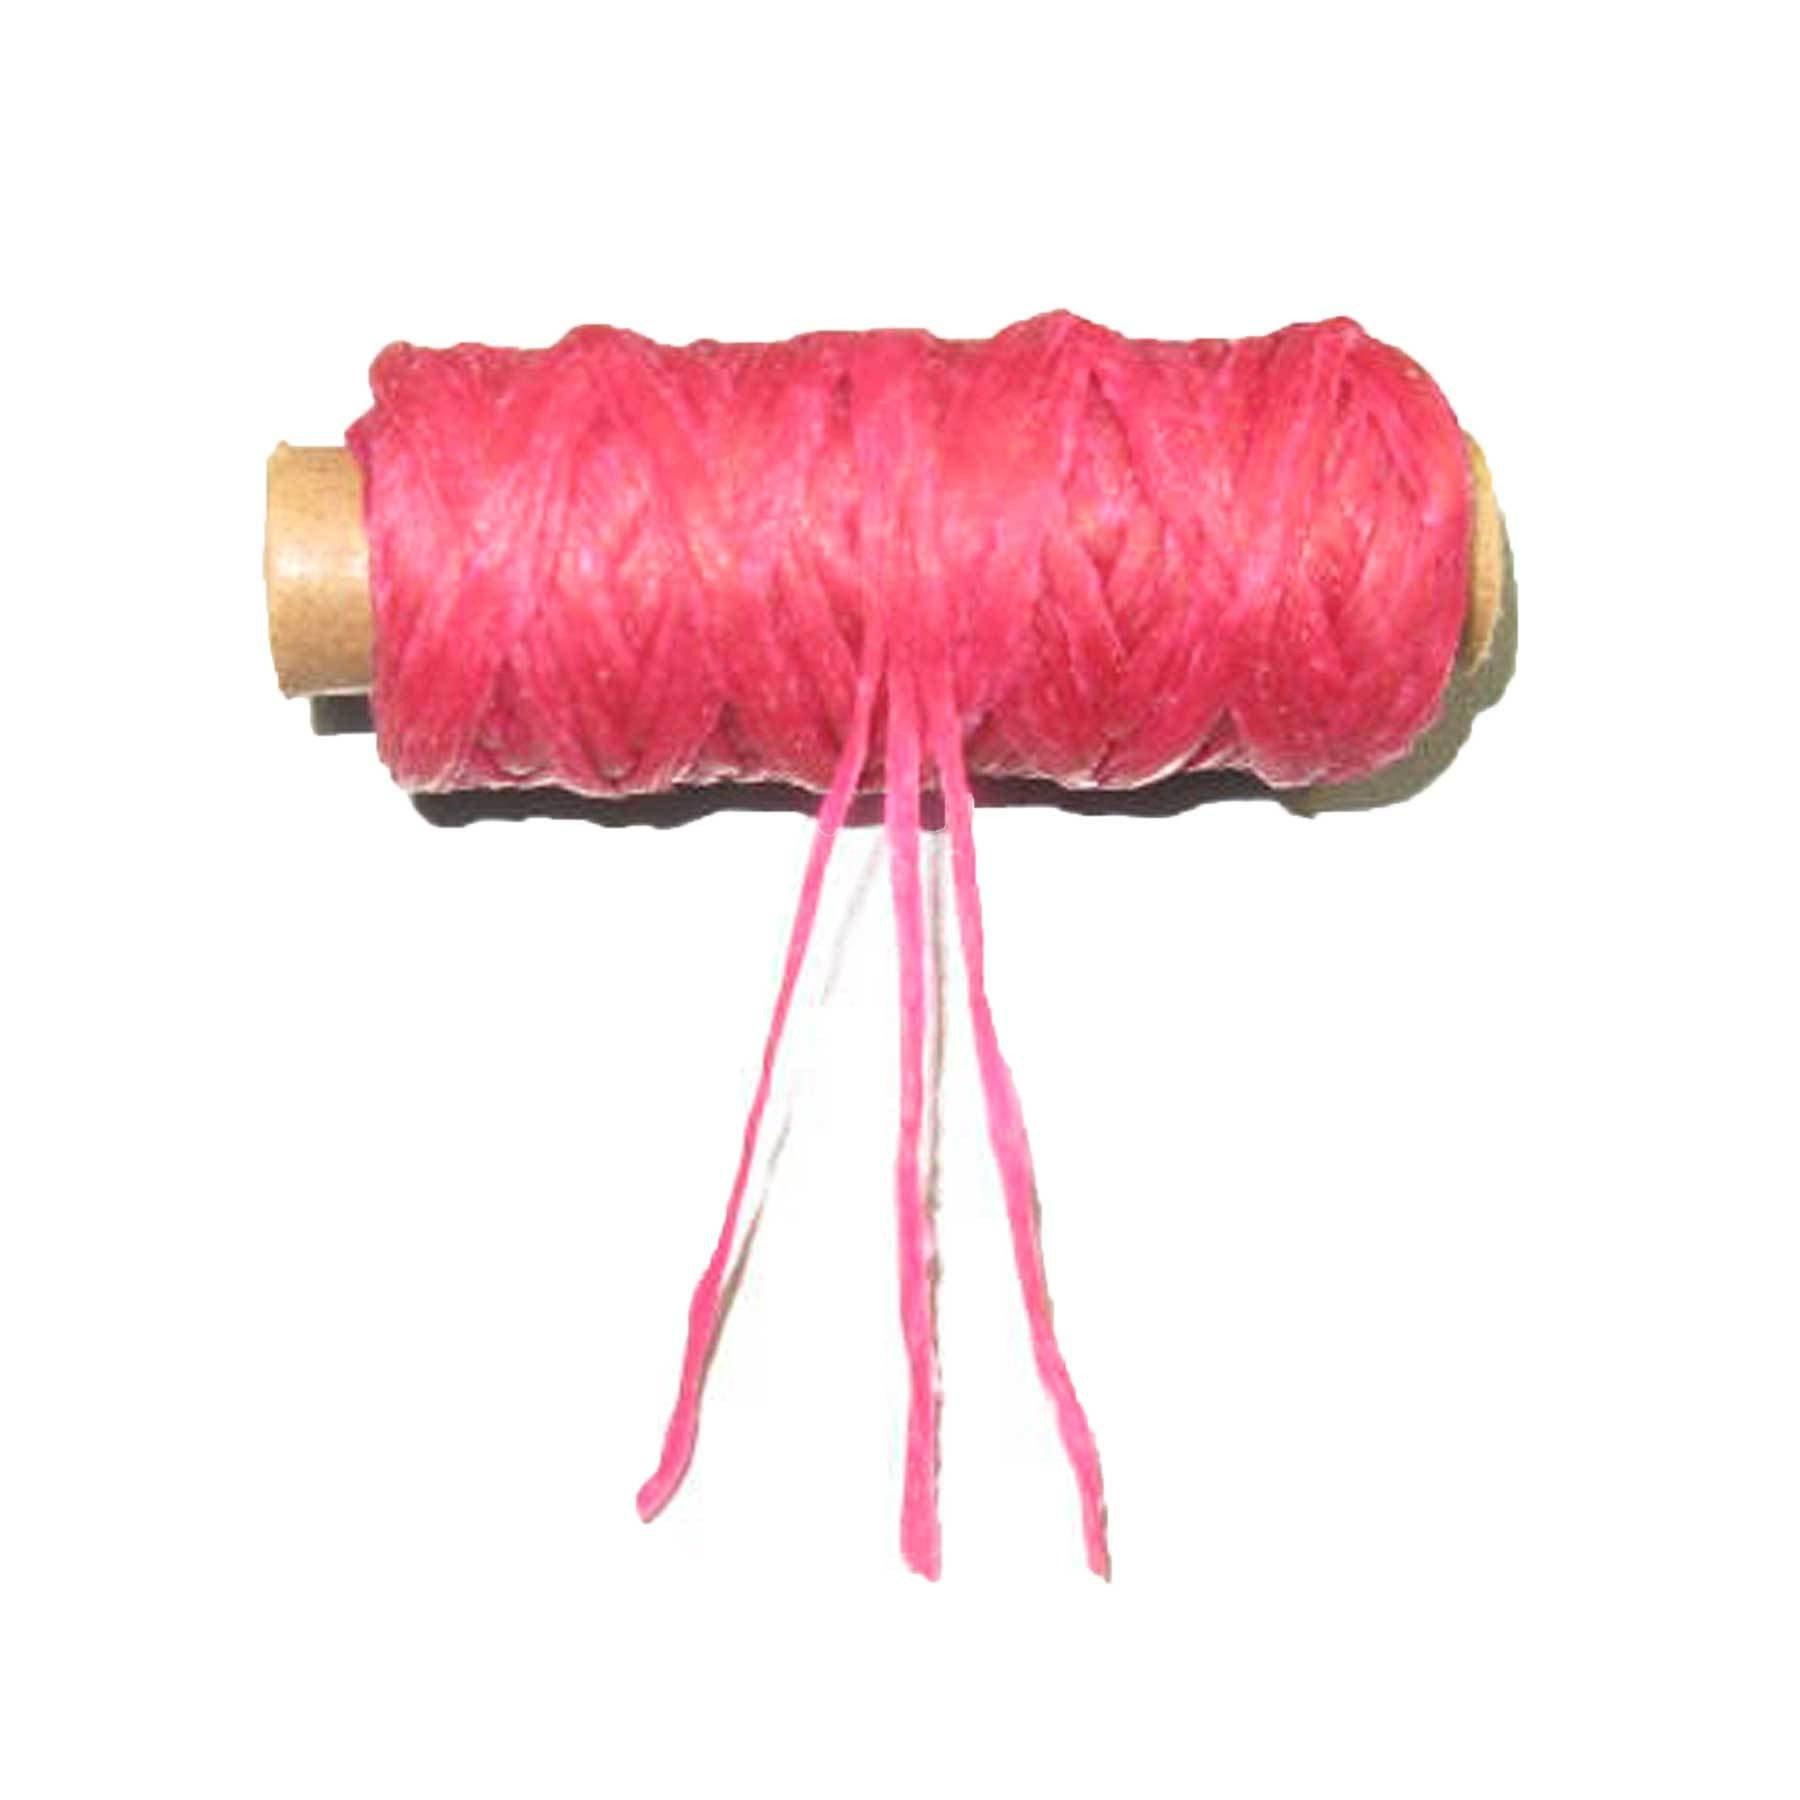 Artificial Sinew Pink 3609 20yd Thread Beadwork Dream Catchers Leathercraft